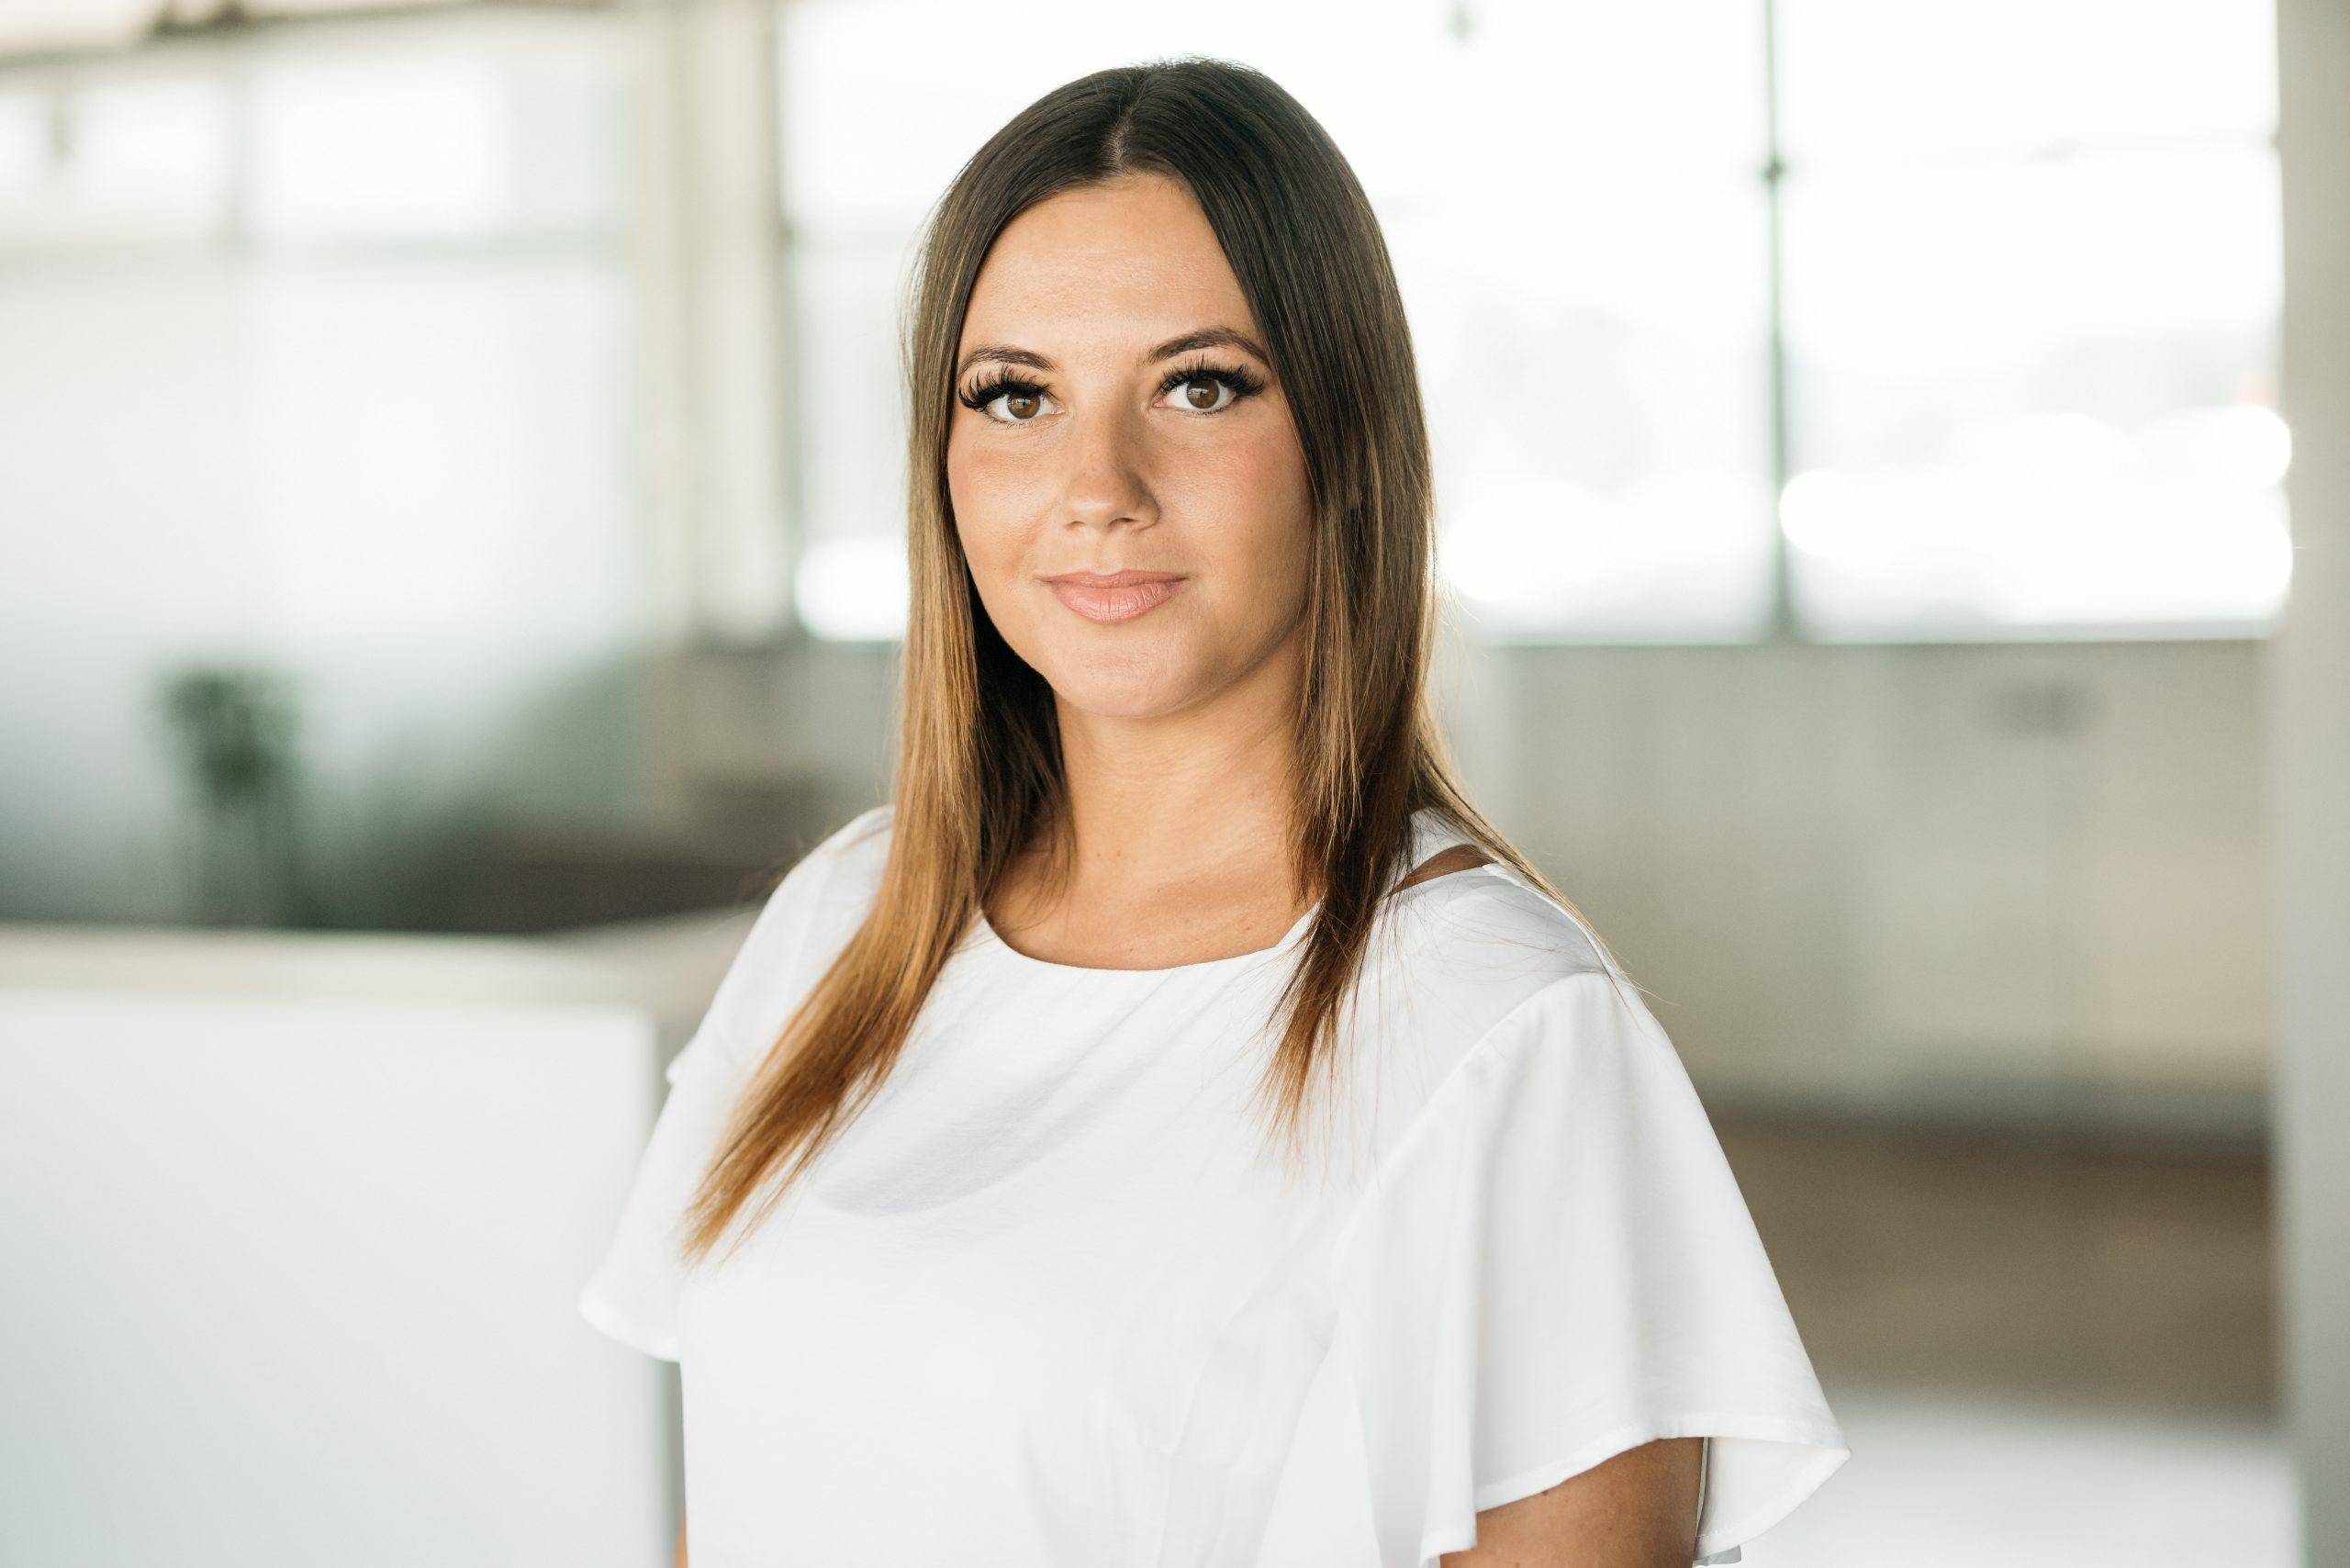 Natalie Pandiova